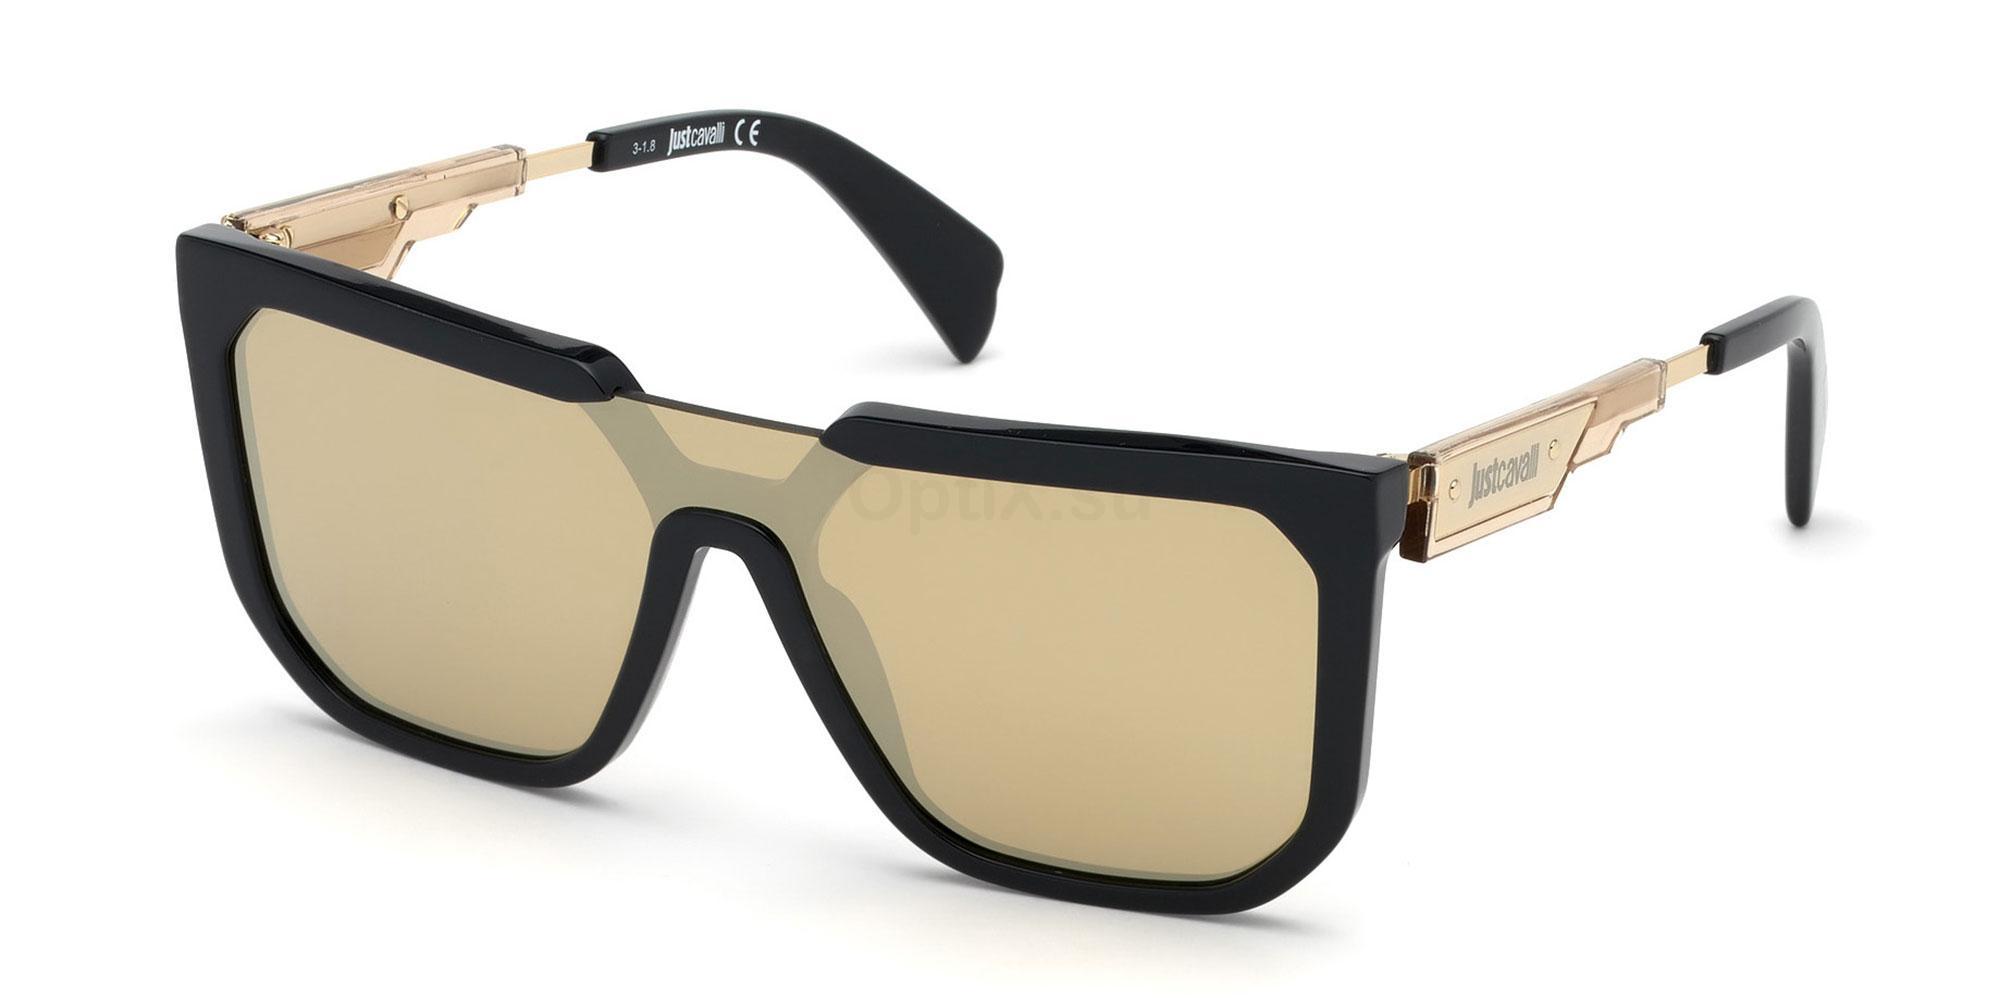 01G JC870S Sunglasses, Just Cavalli